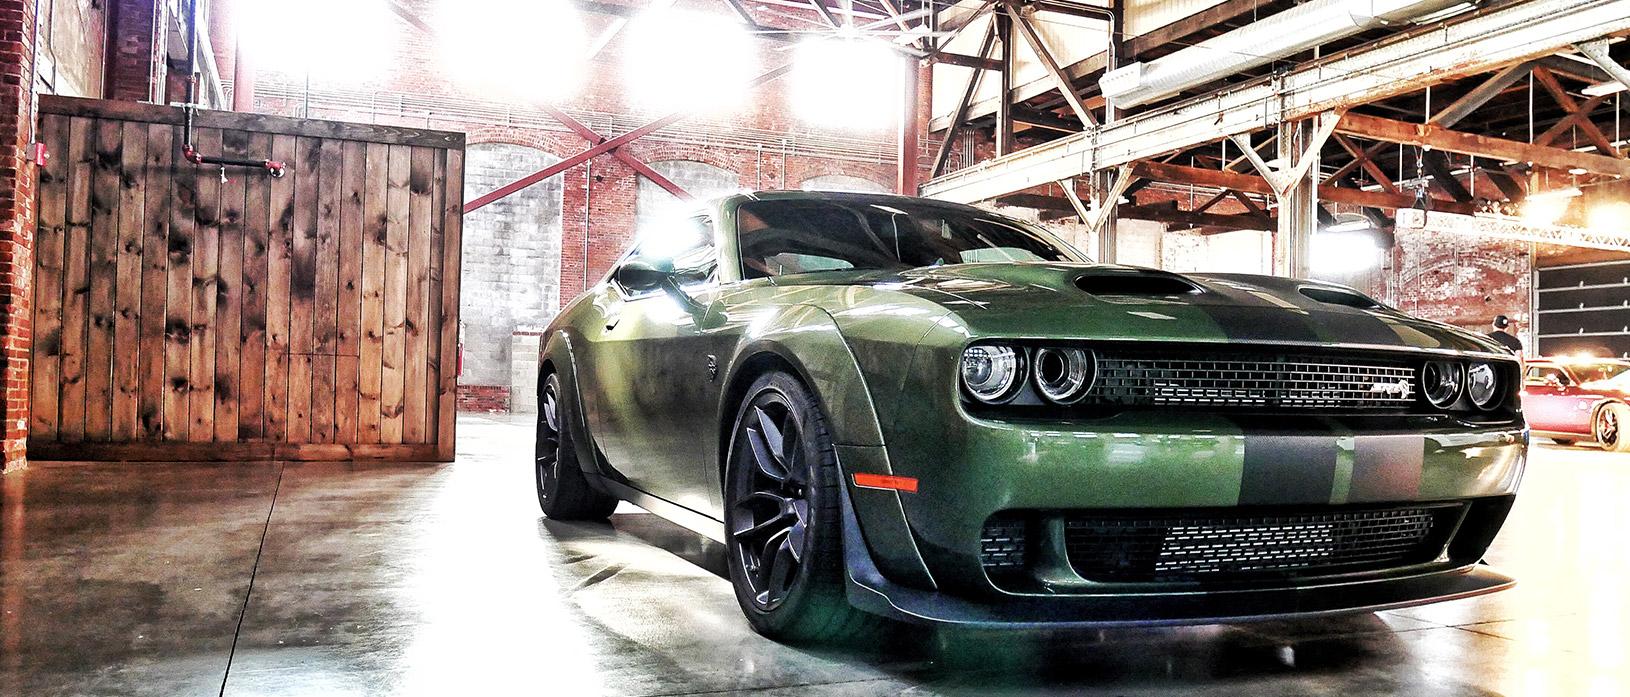 F8 Green Redeye